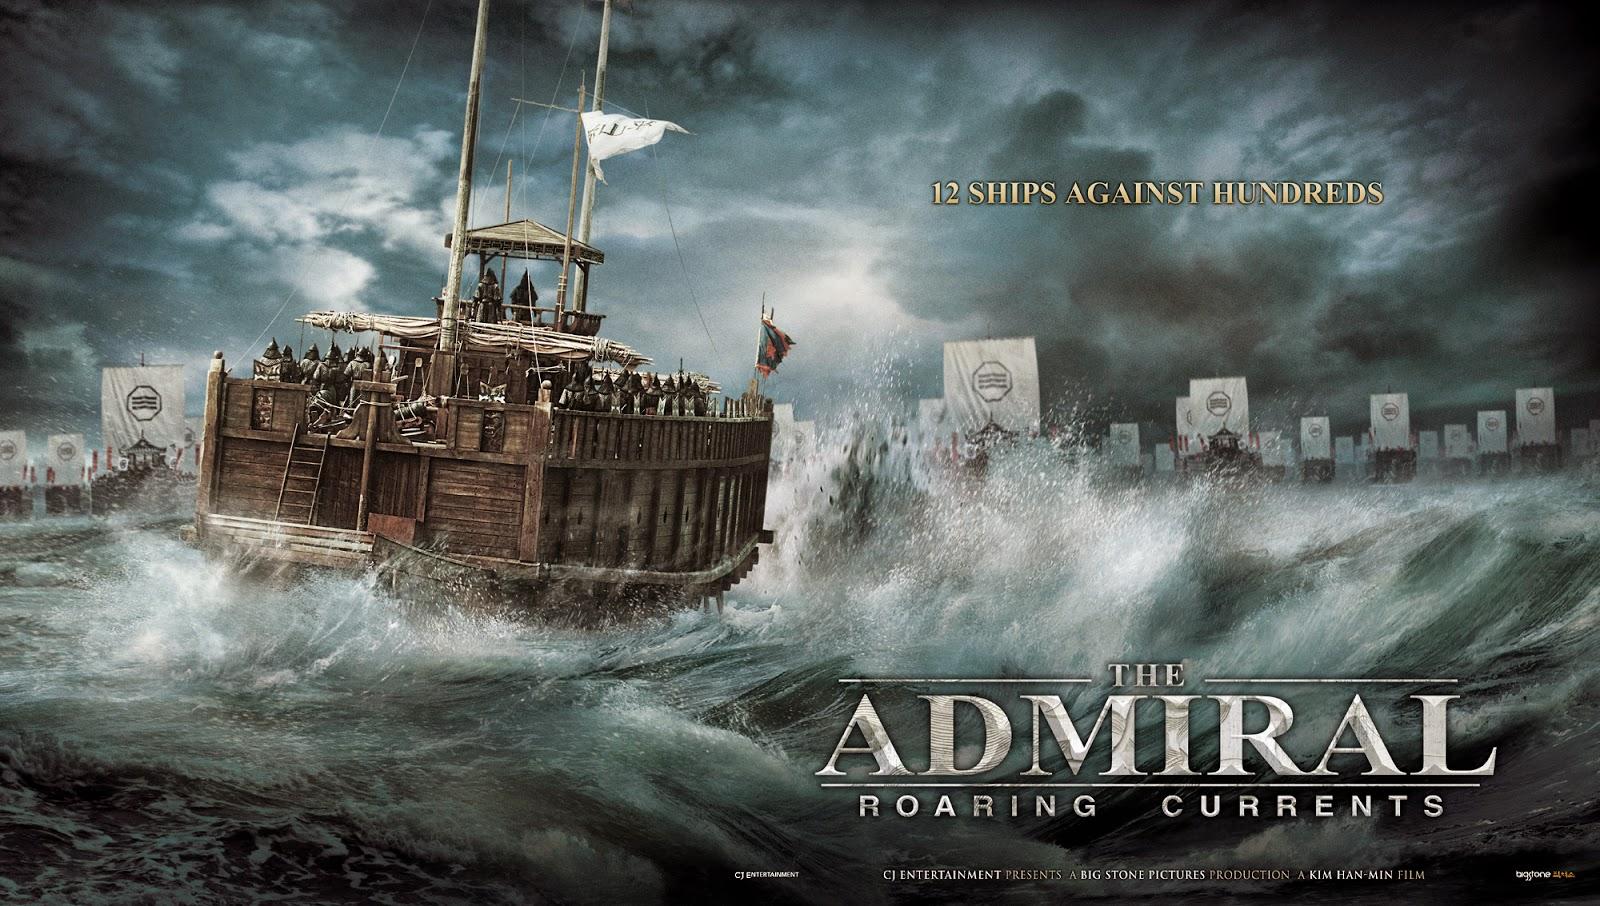 Đại Thủy Chiến - The Admiral: Roaring Currents